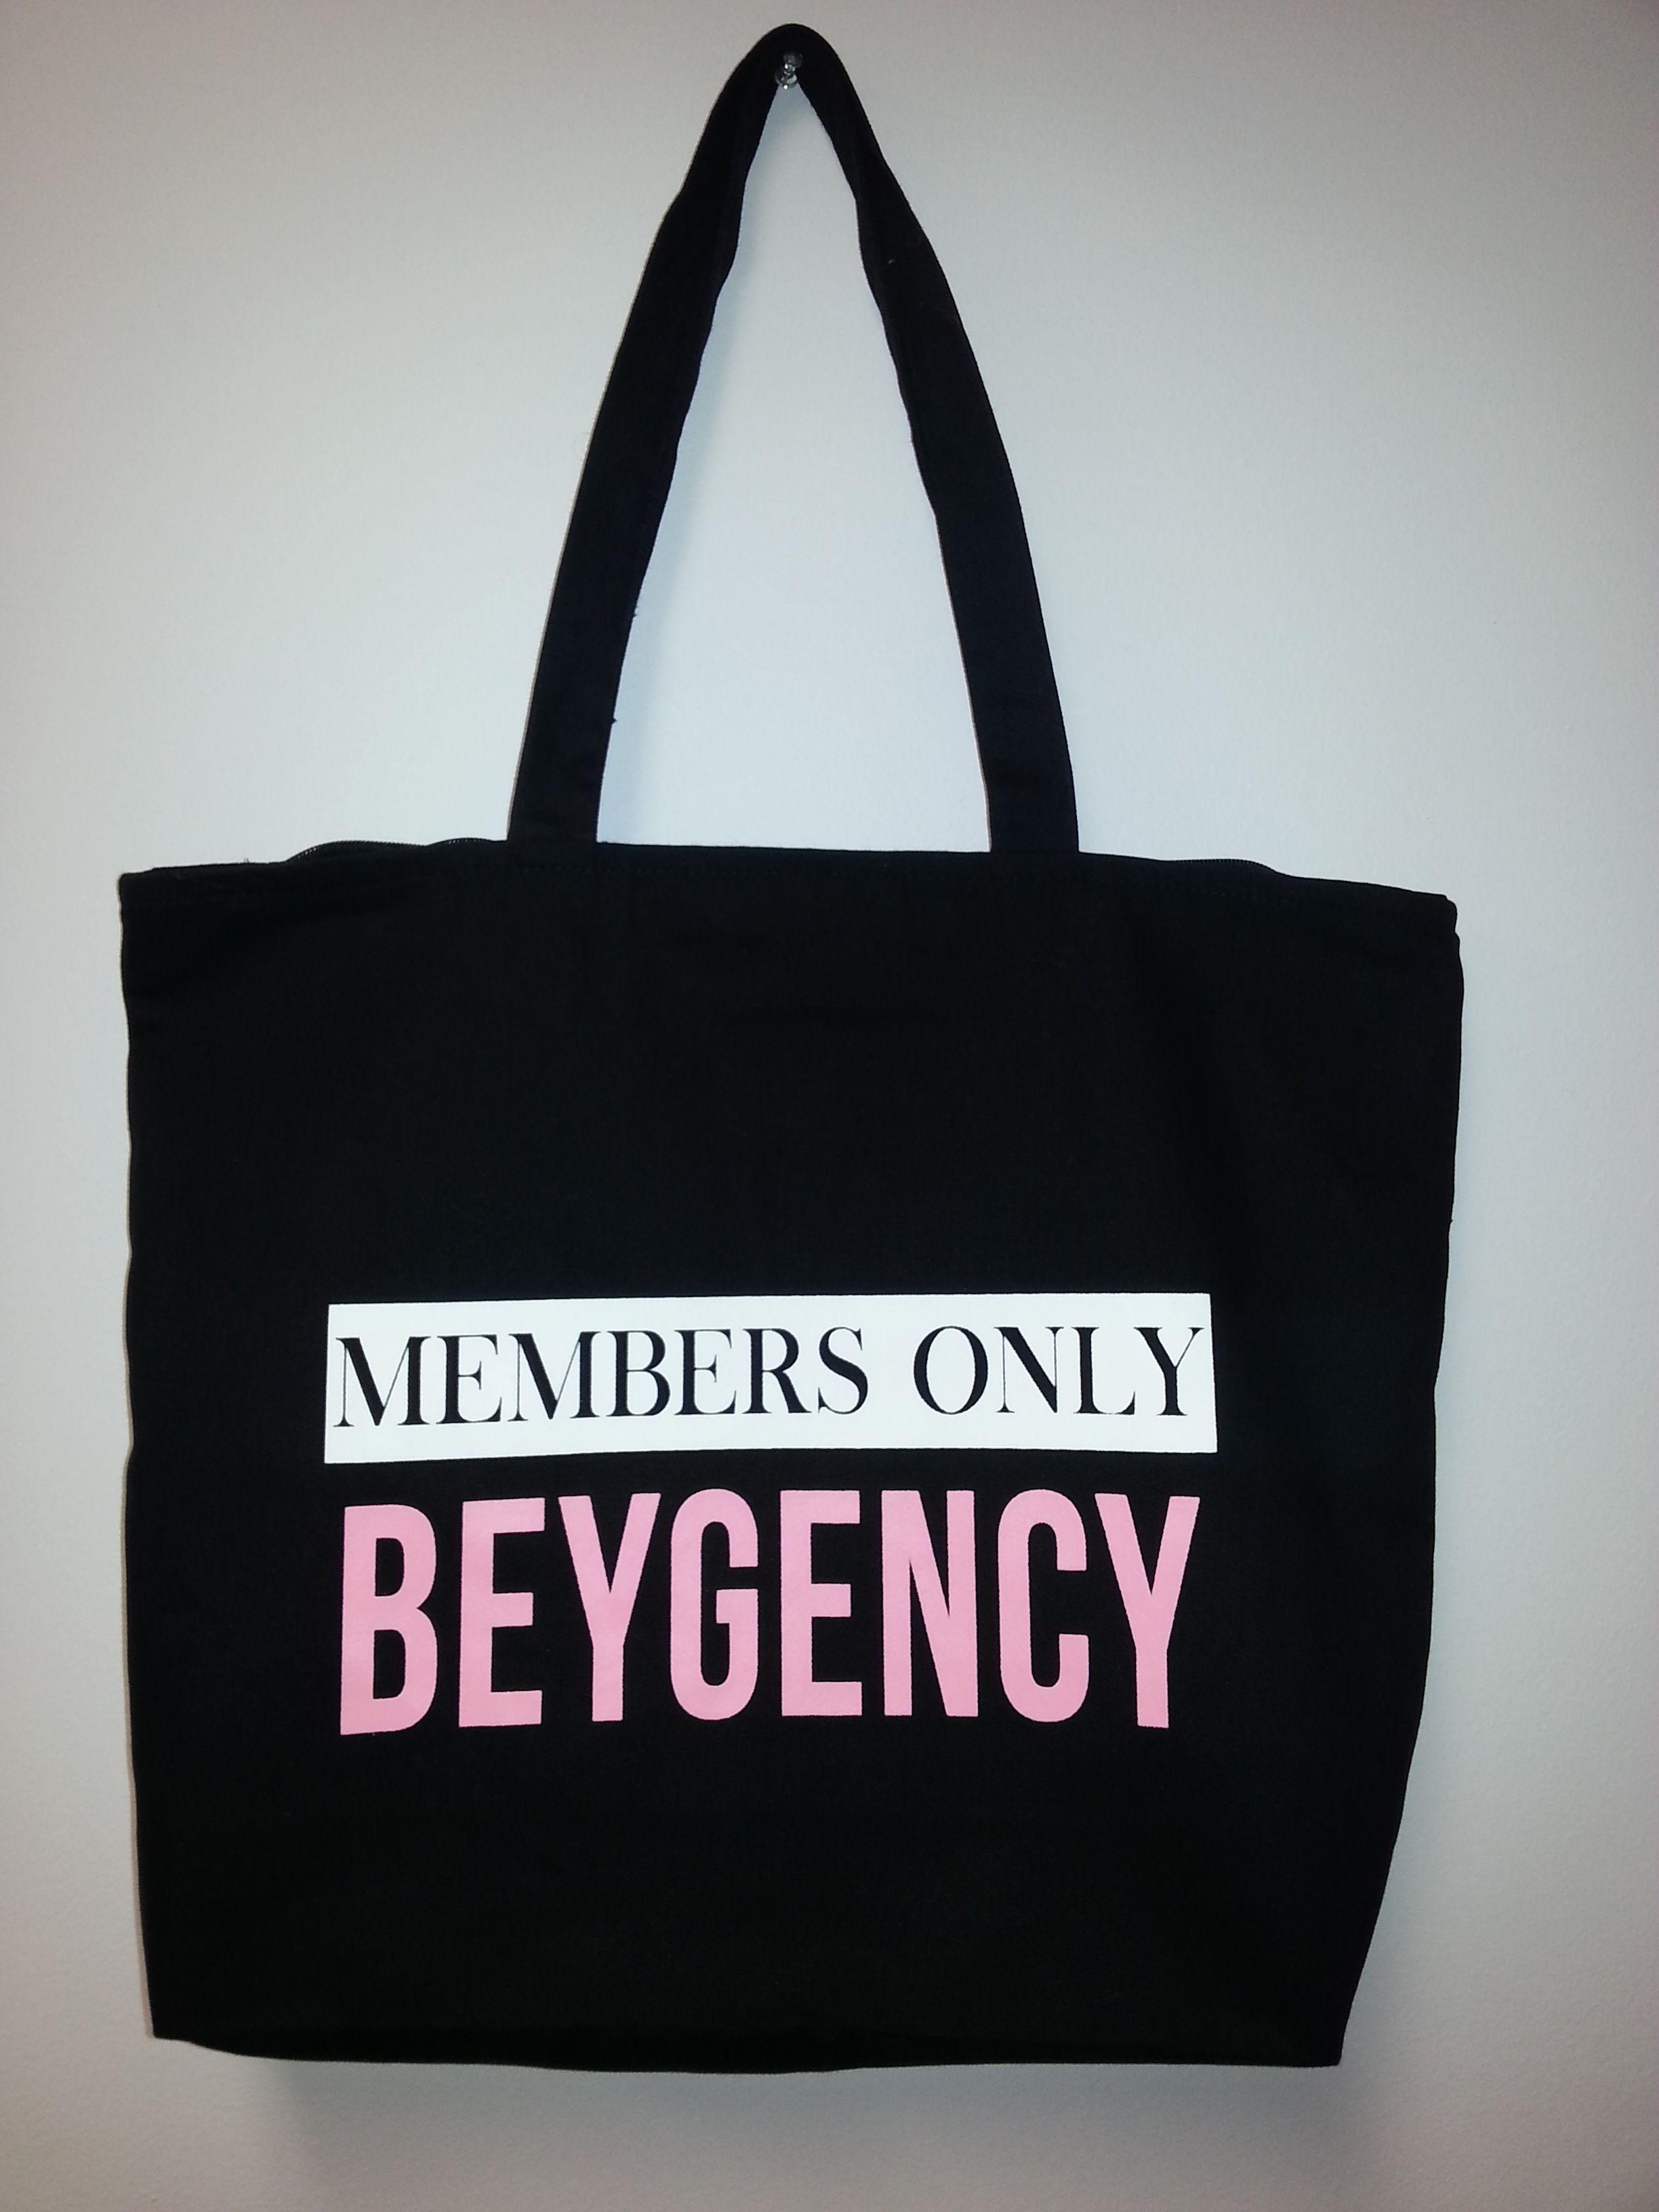 Get your exclusive MEMBERS ONLY BEYGENCY bag! www.bossydesigns.com